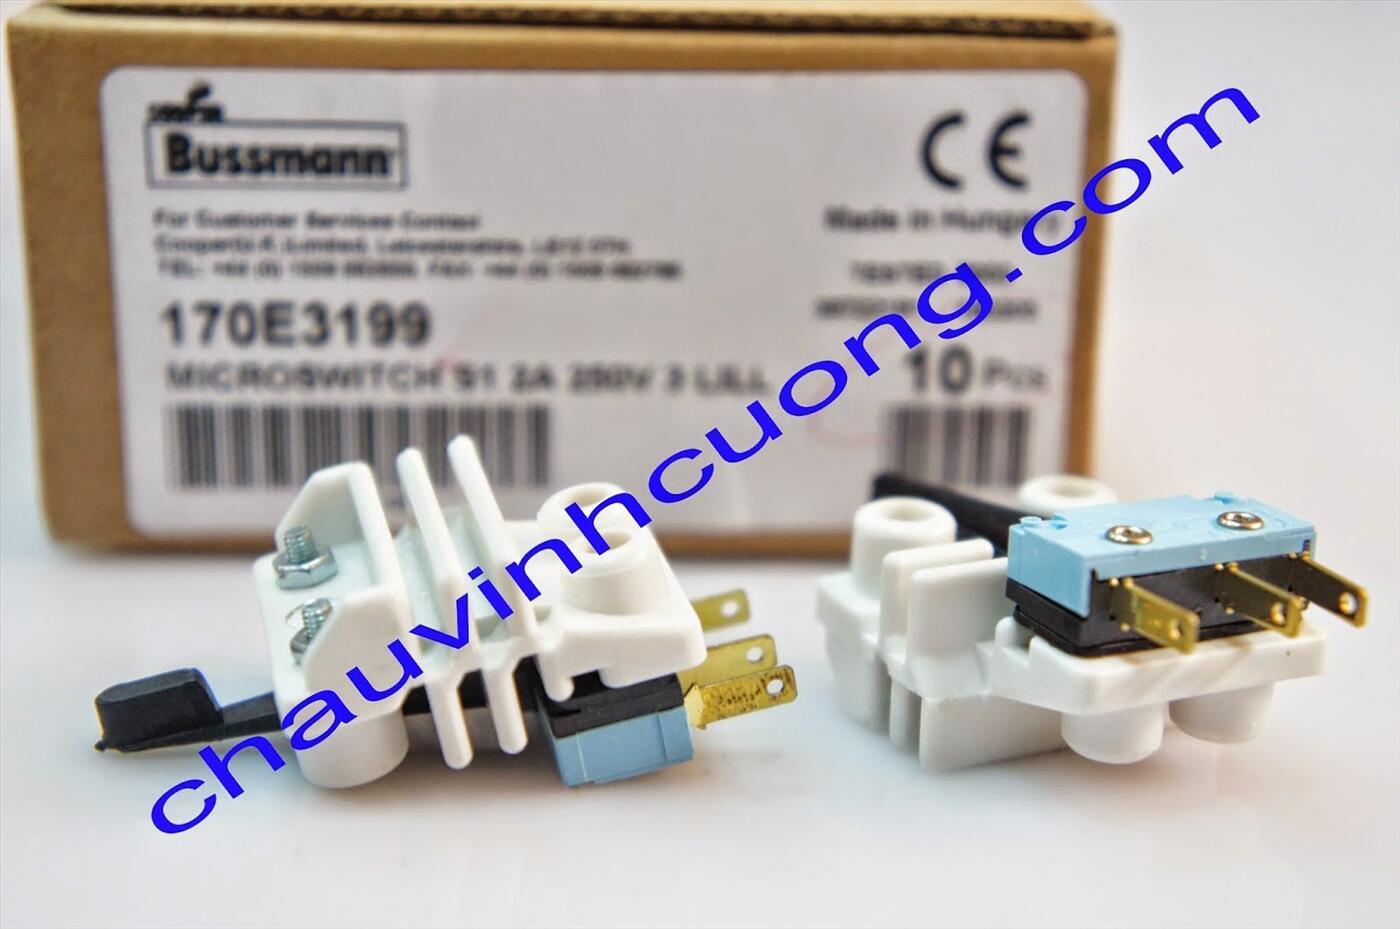 Micro Switch Bussmann 170E3199